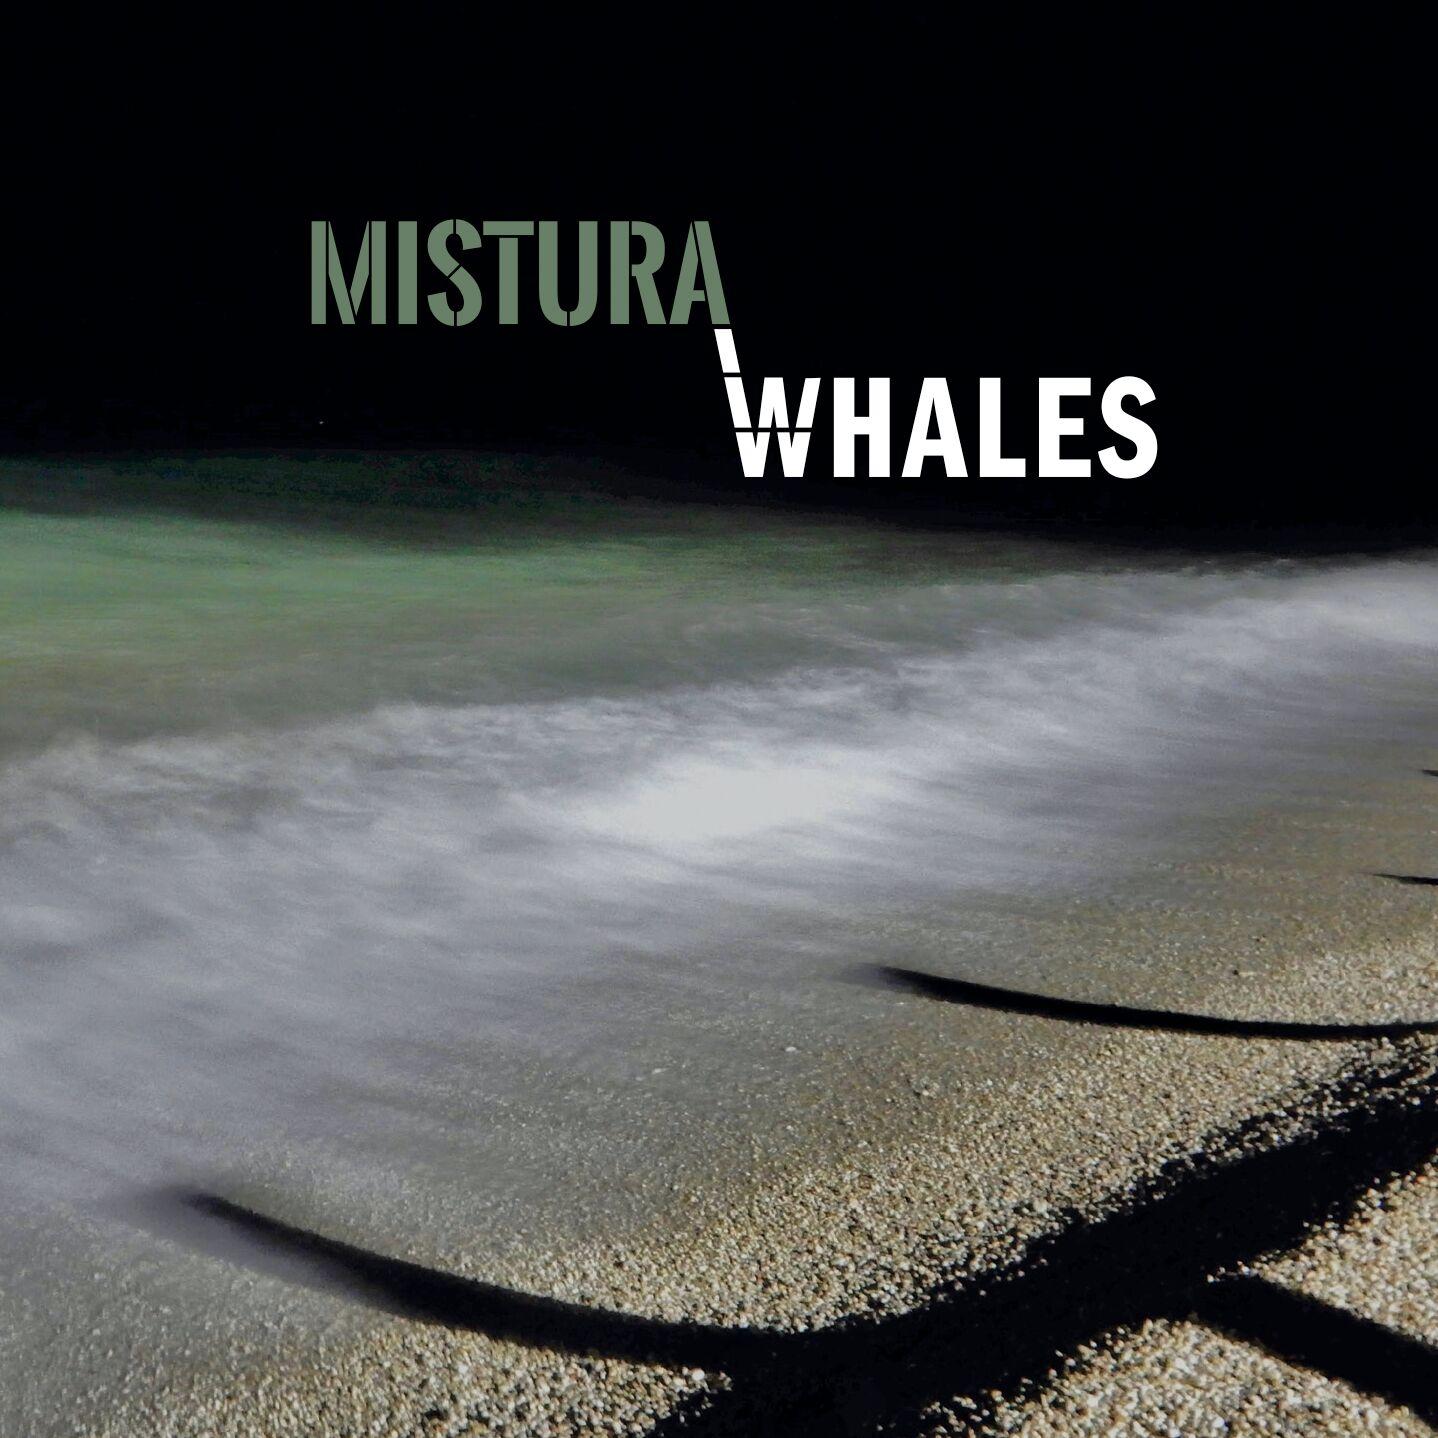 Mistura <br/> Whales <br/> Emme Record Label, 2019